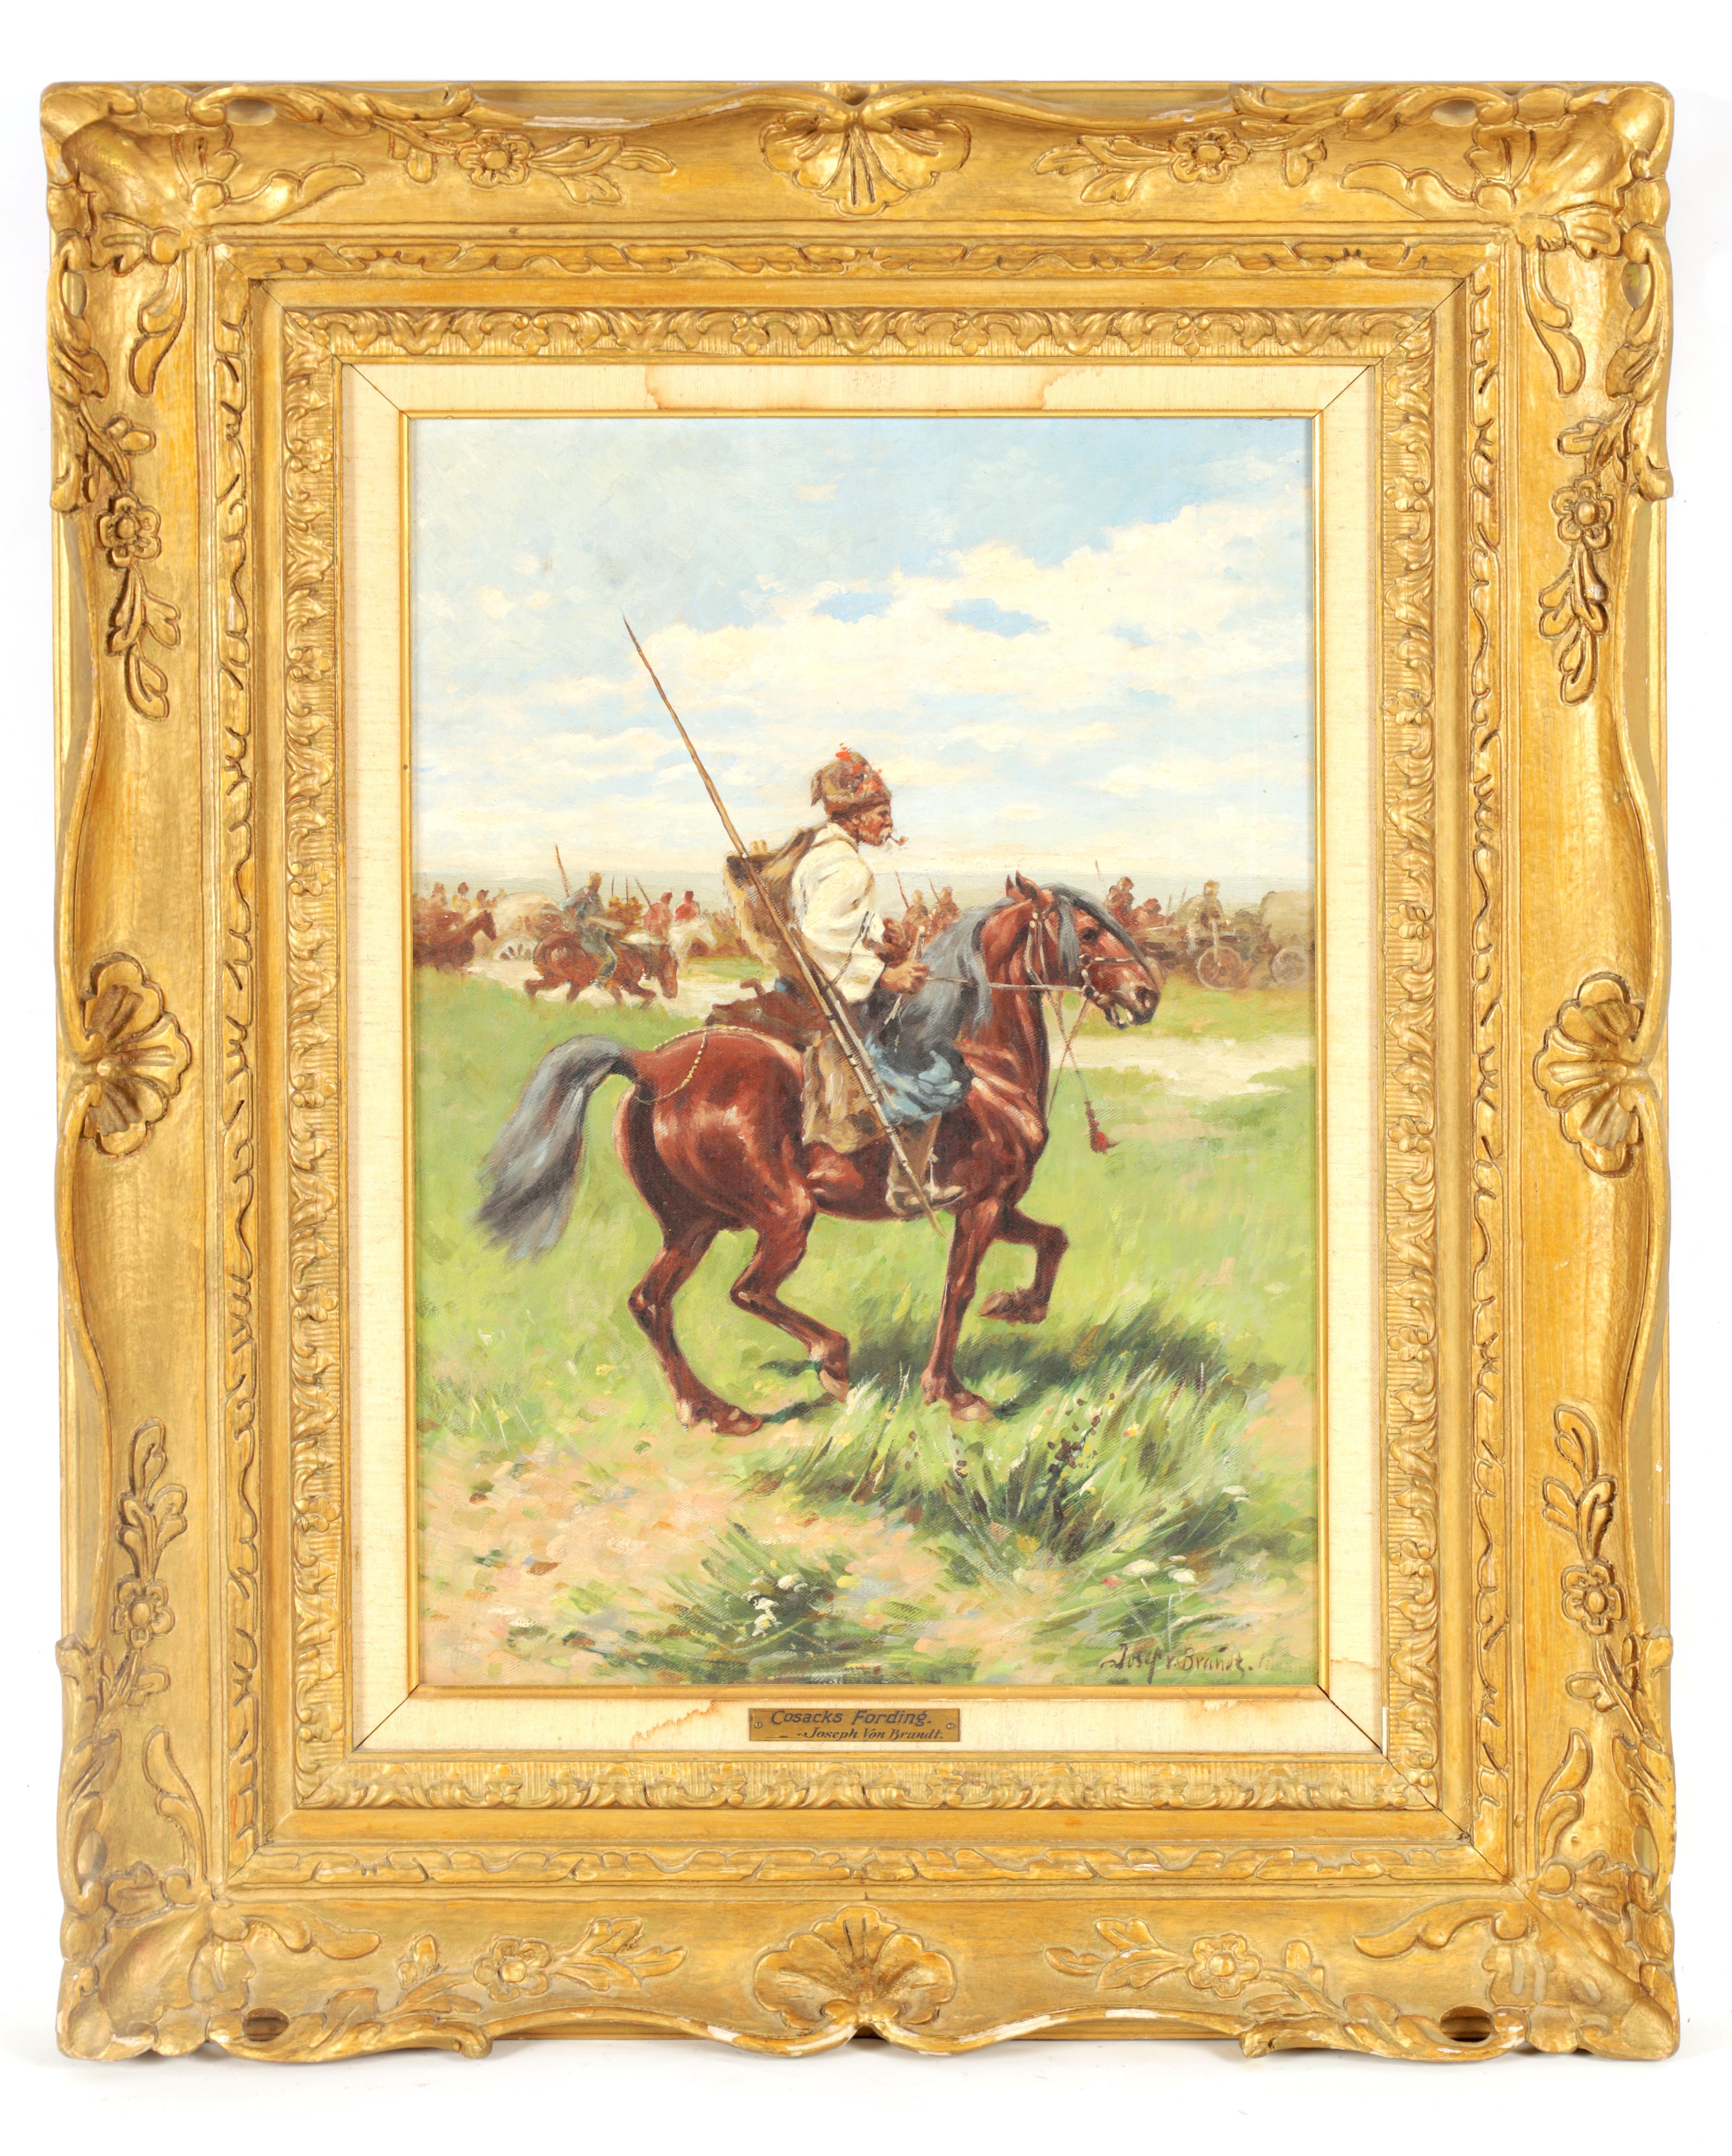 JOSEF VON BRANDT. POLISH, 1841-1928 OIL ON CANVAS Cossacks fording 49.5cm high, 33.5cm wide - signed